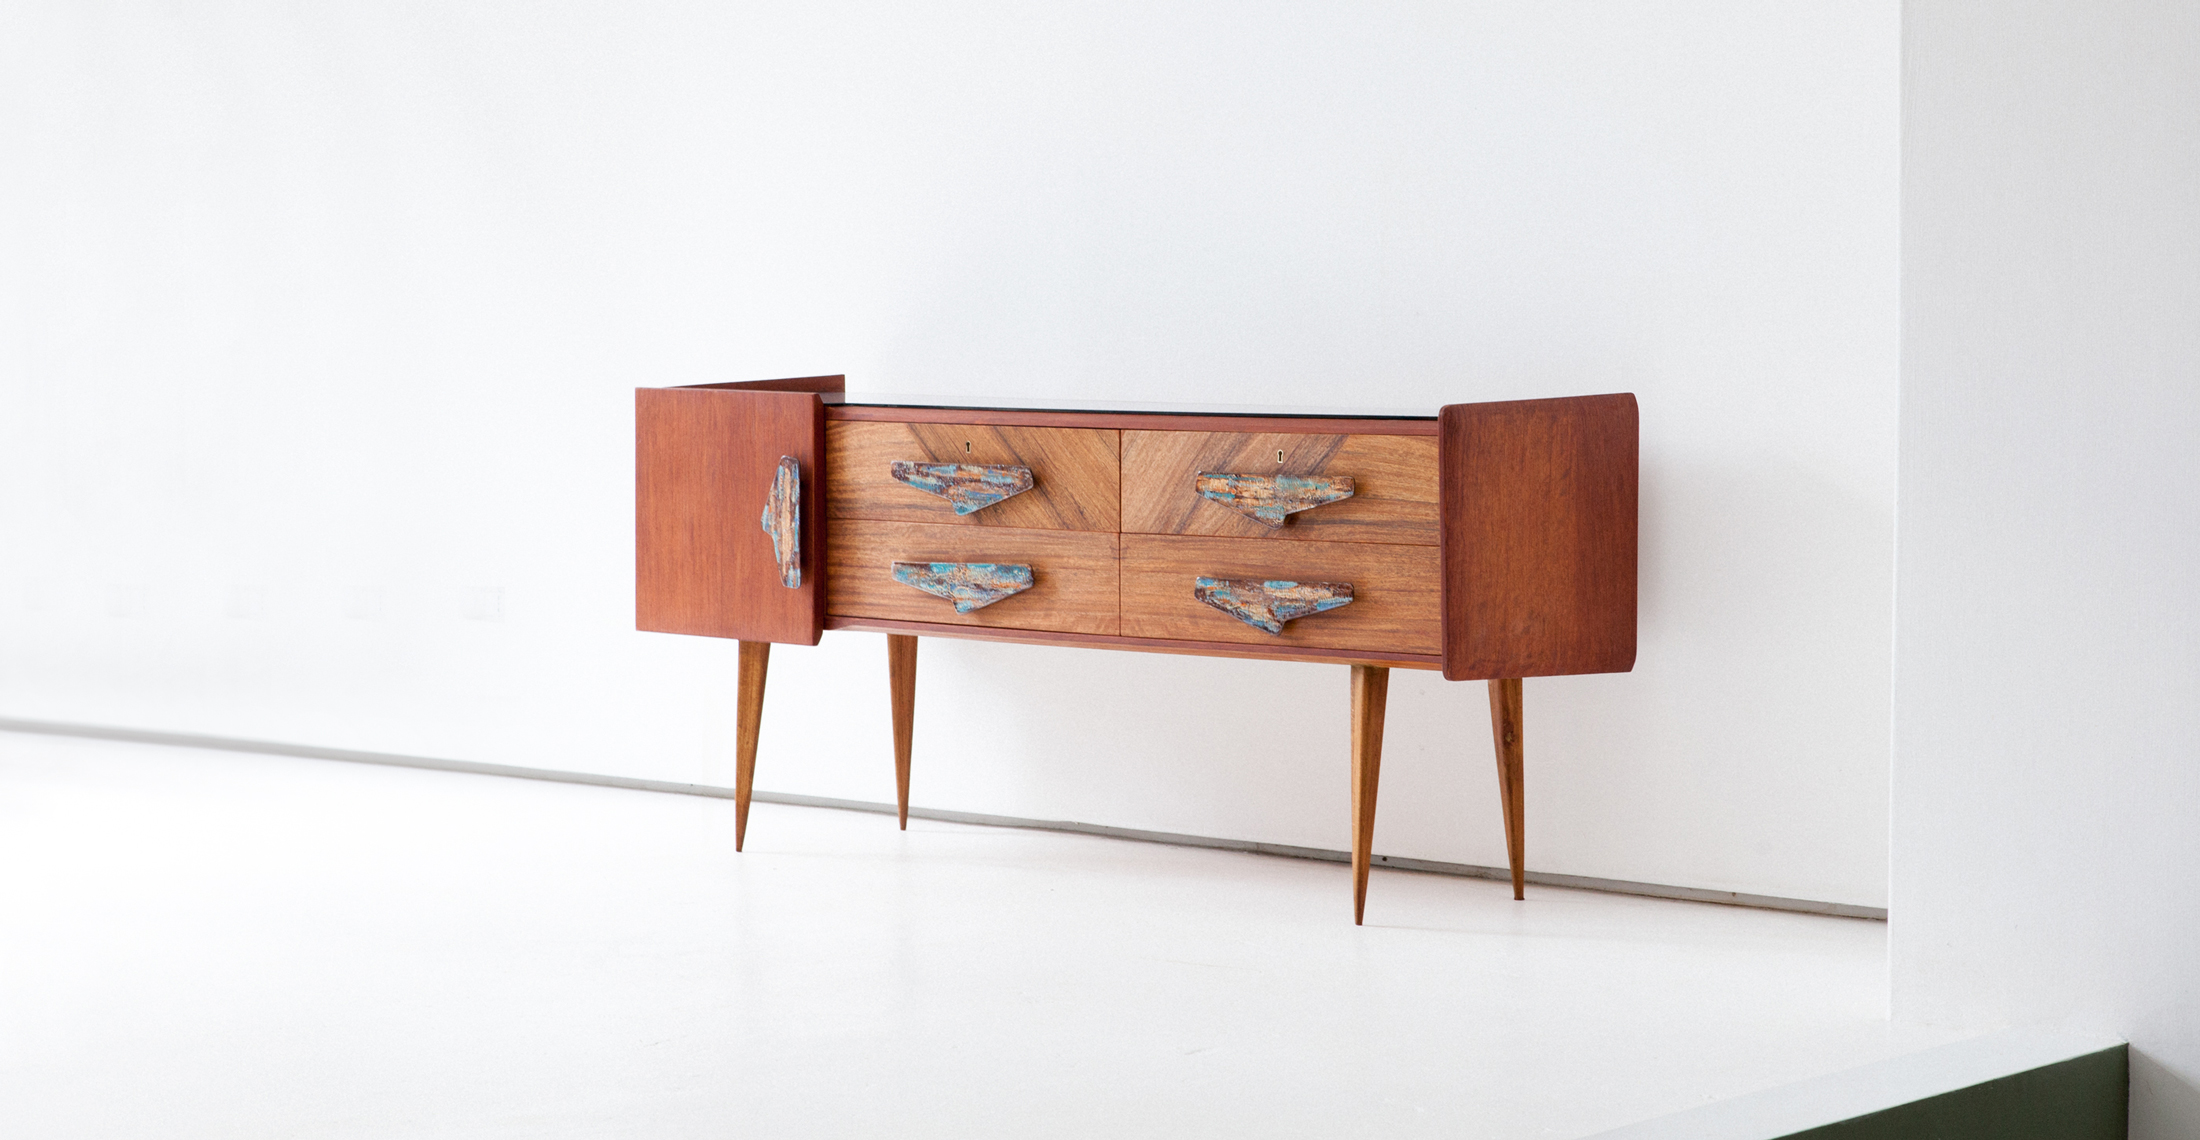 italian-teak-mahogany-sideboard-credenza-110.1